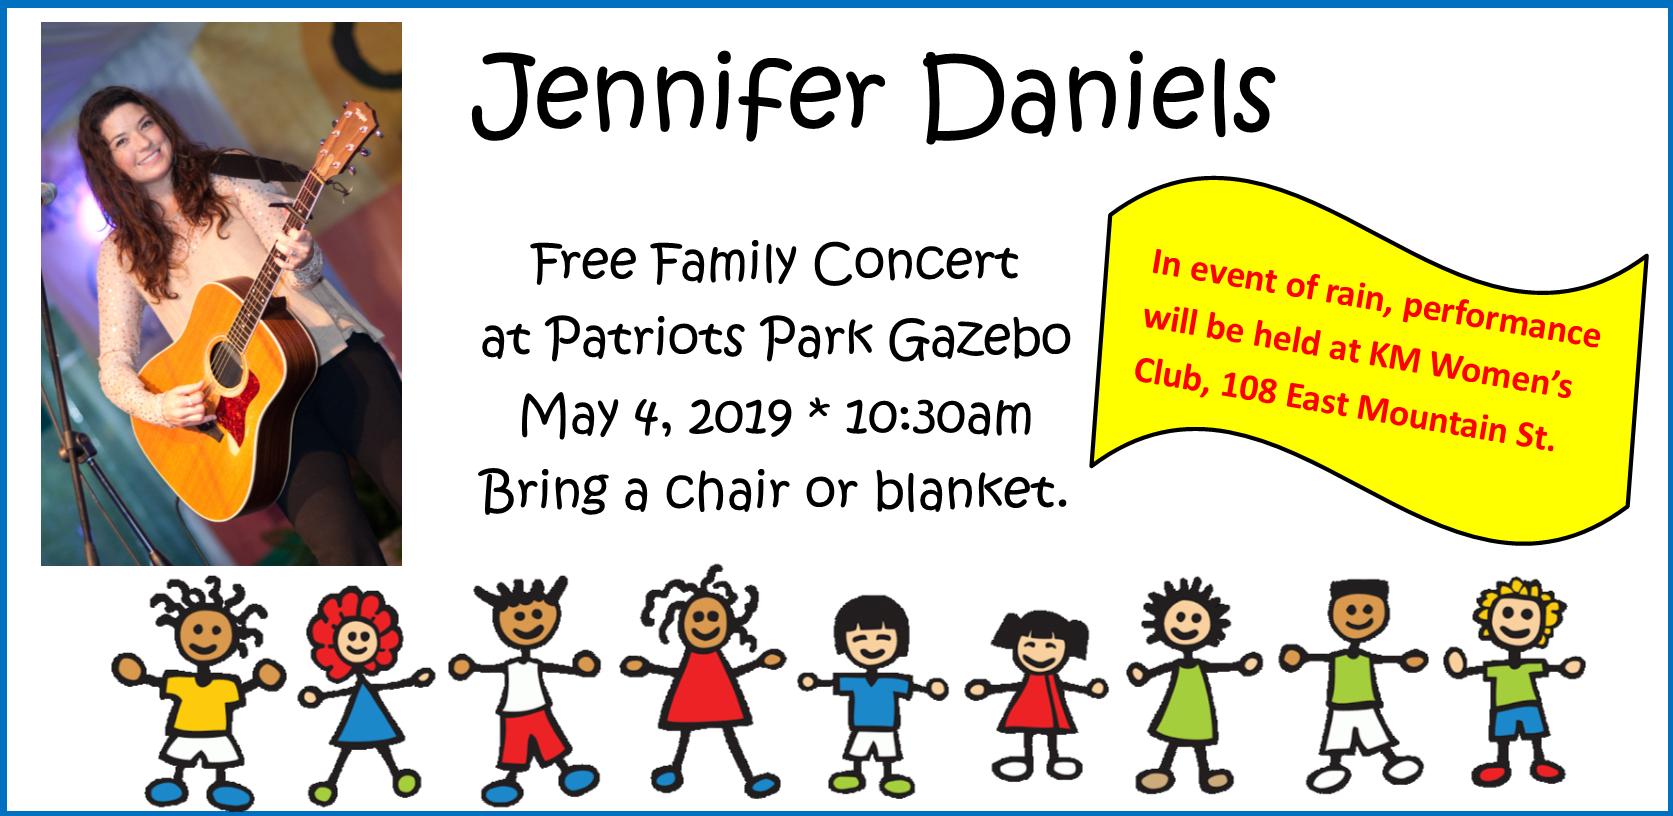 Jennifer Daniels- In event of rain, performance will be held at KM Women's Club, 108 East Mountain St.